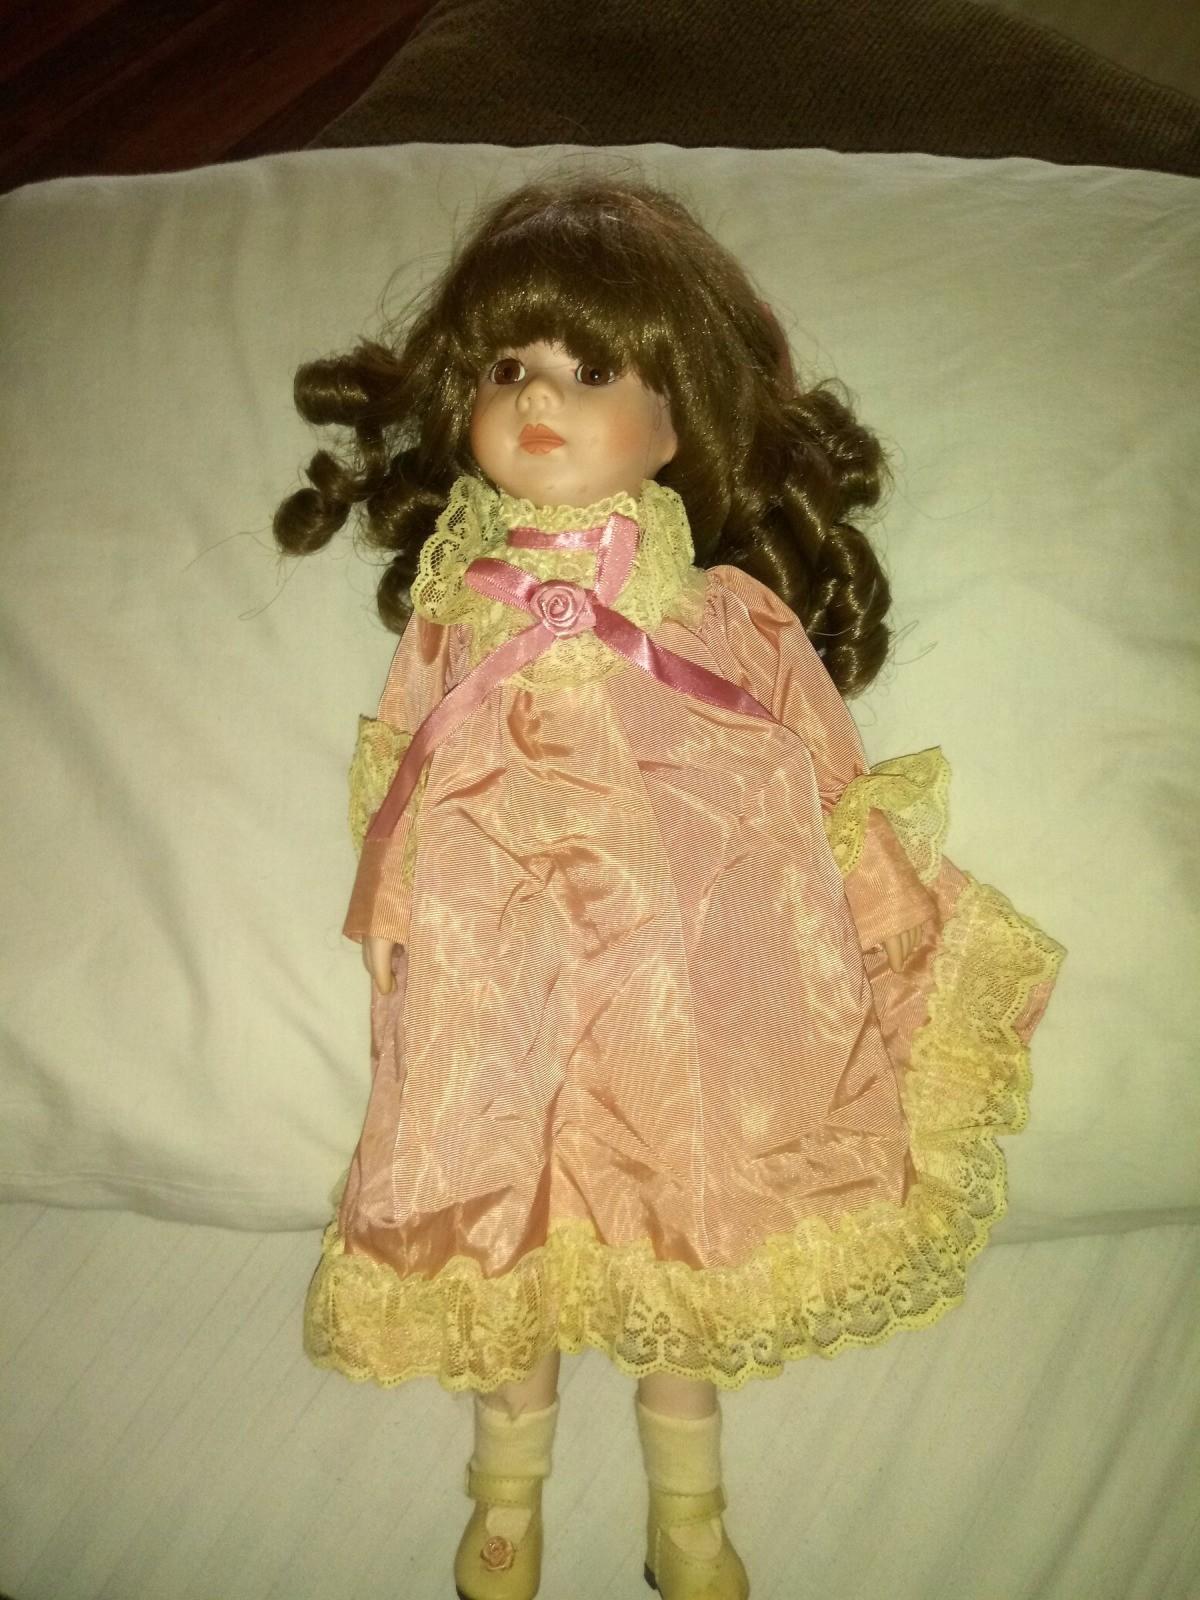 Finding the Value of Brinn Porcelain Dolls?  ThriftyFun